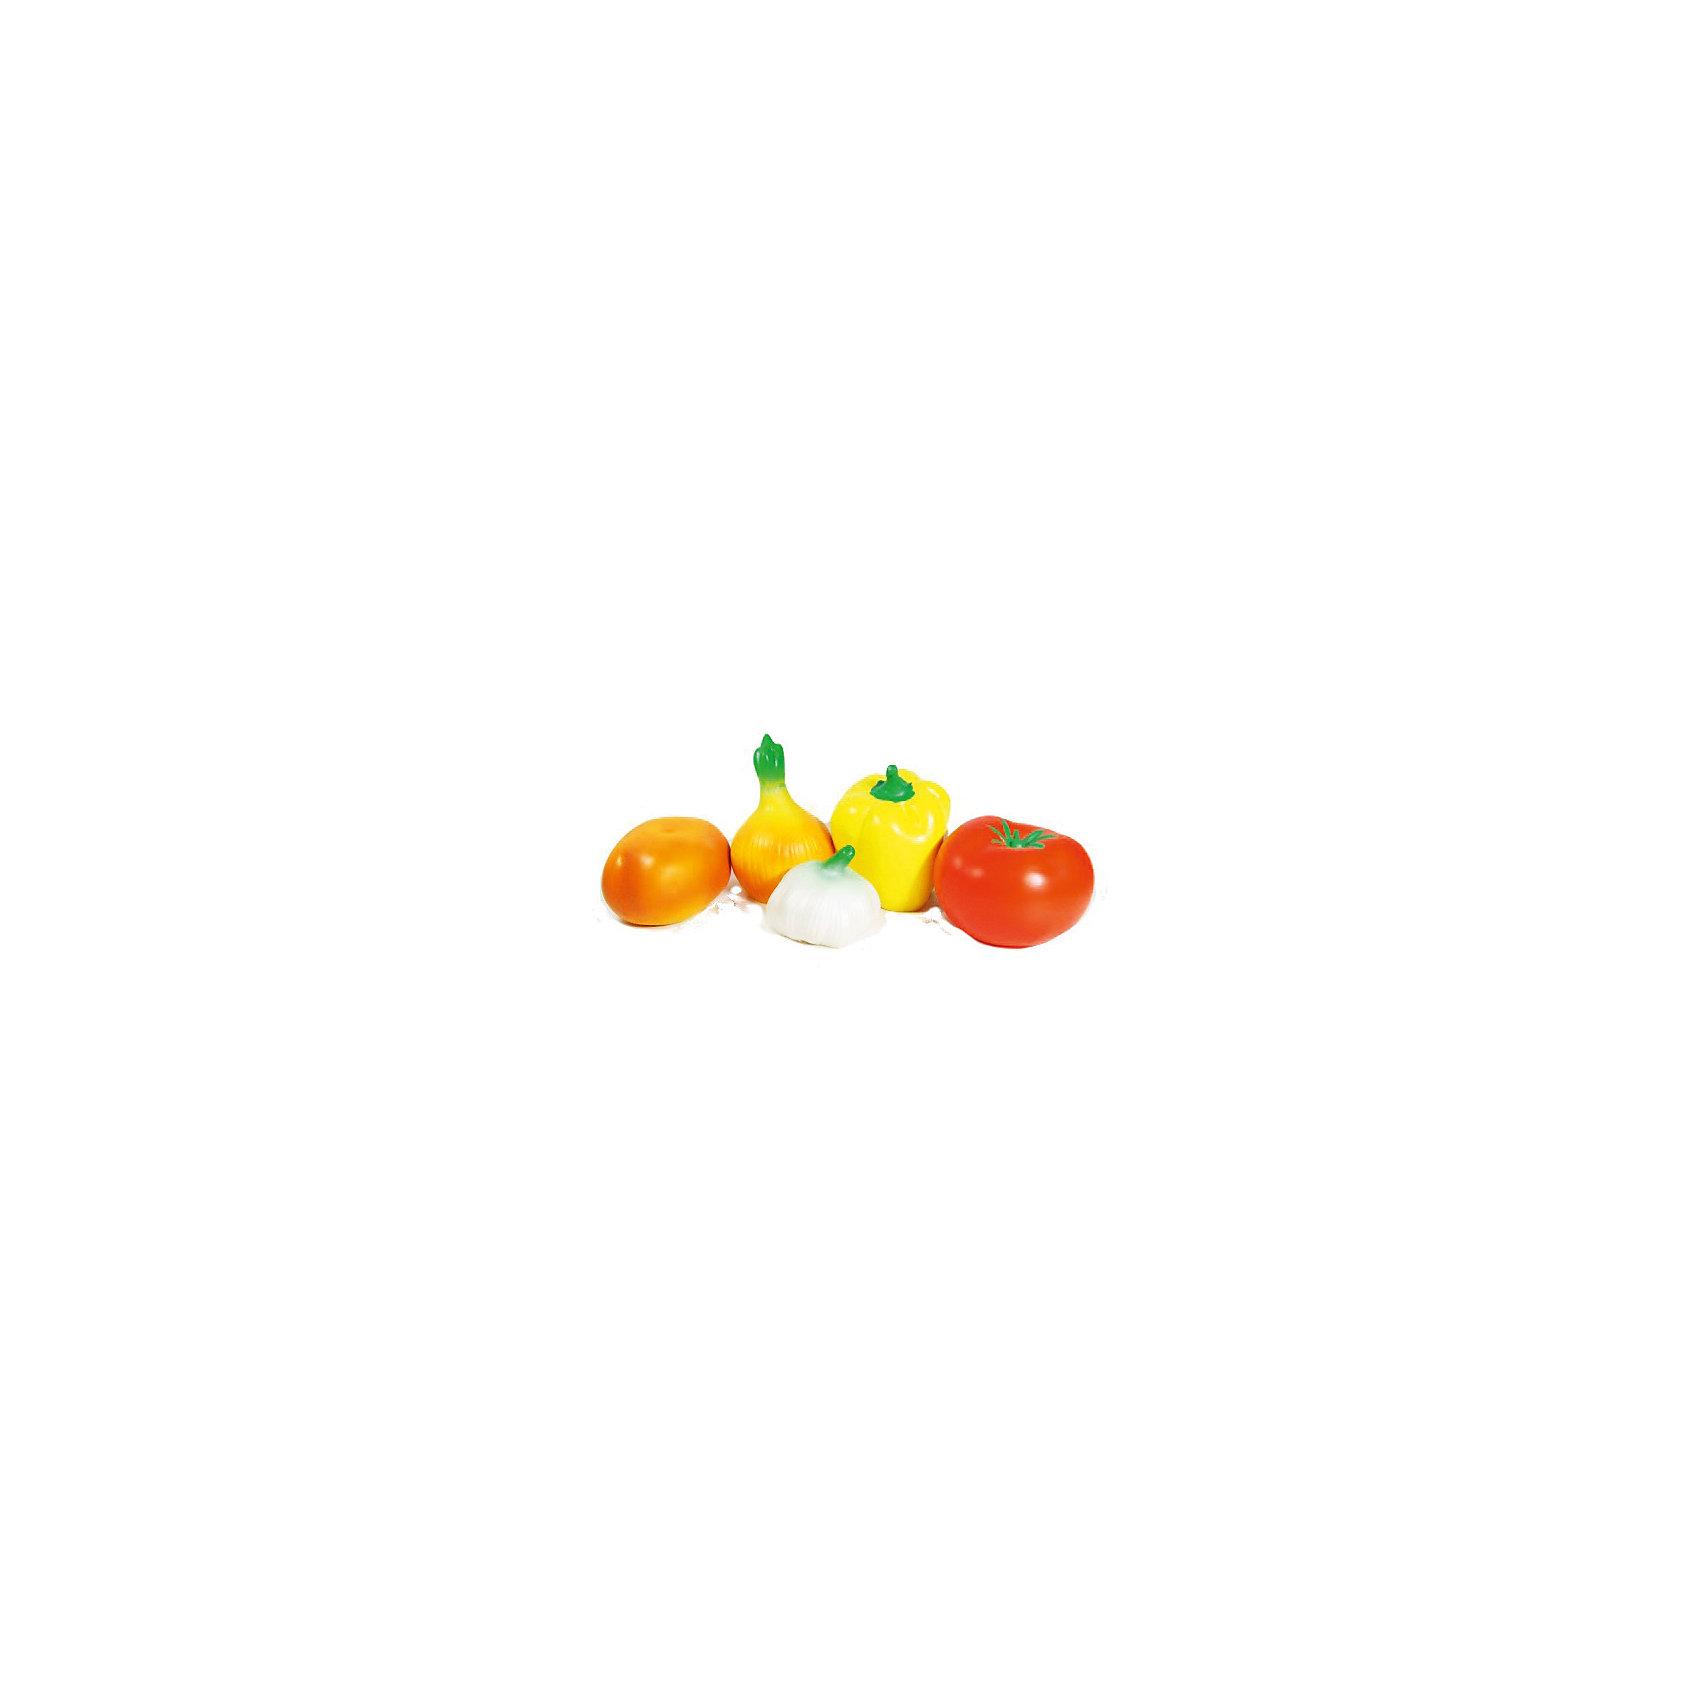 Набор Овощи, Кудесники<br><br>Ширина мм: 200<br>Глубина мм: 200<br>Высота мм: 95<br>Вес г: 225<br>Возраст от месяцев: 12<br>Возраст до месяцев: 36<br>Пол: Унисекс<br>Возраст: Детский<br>SKU: 4896450